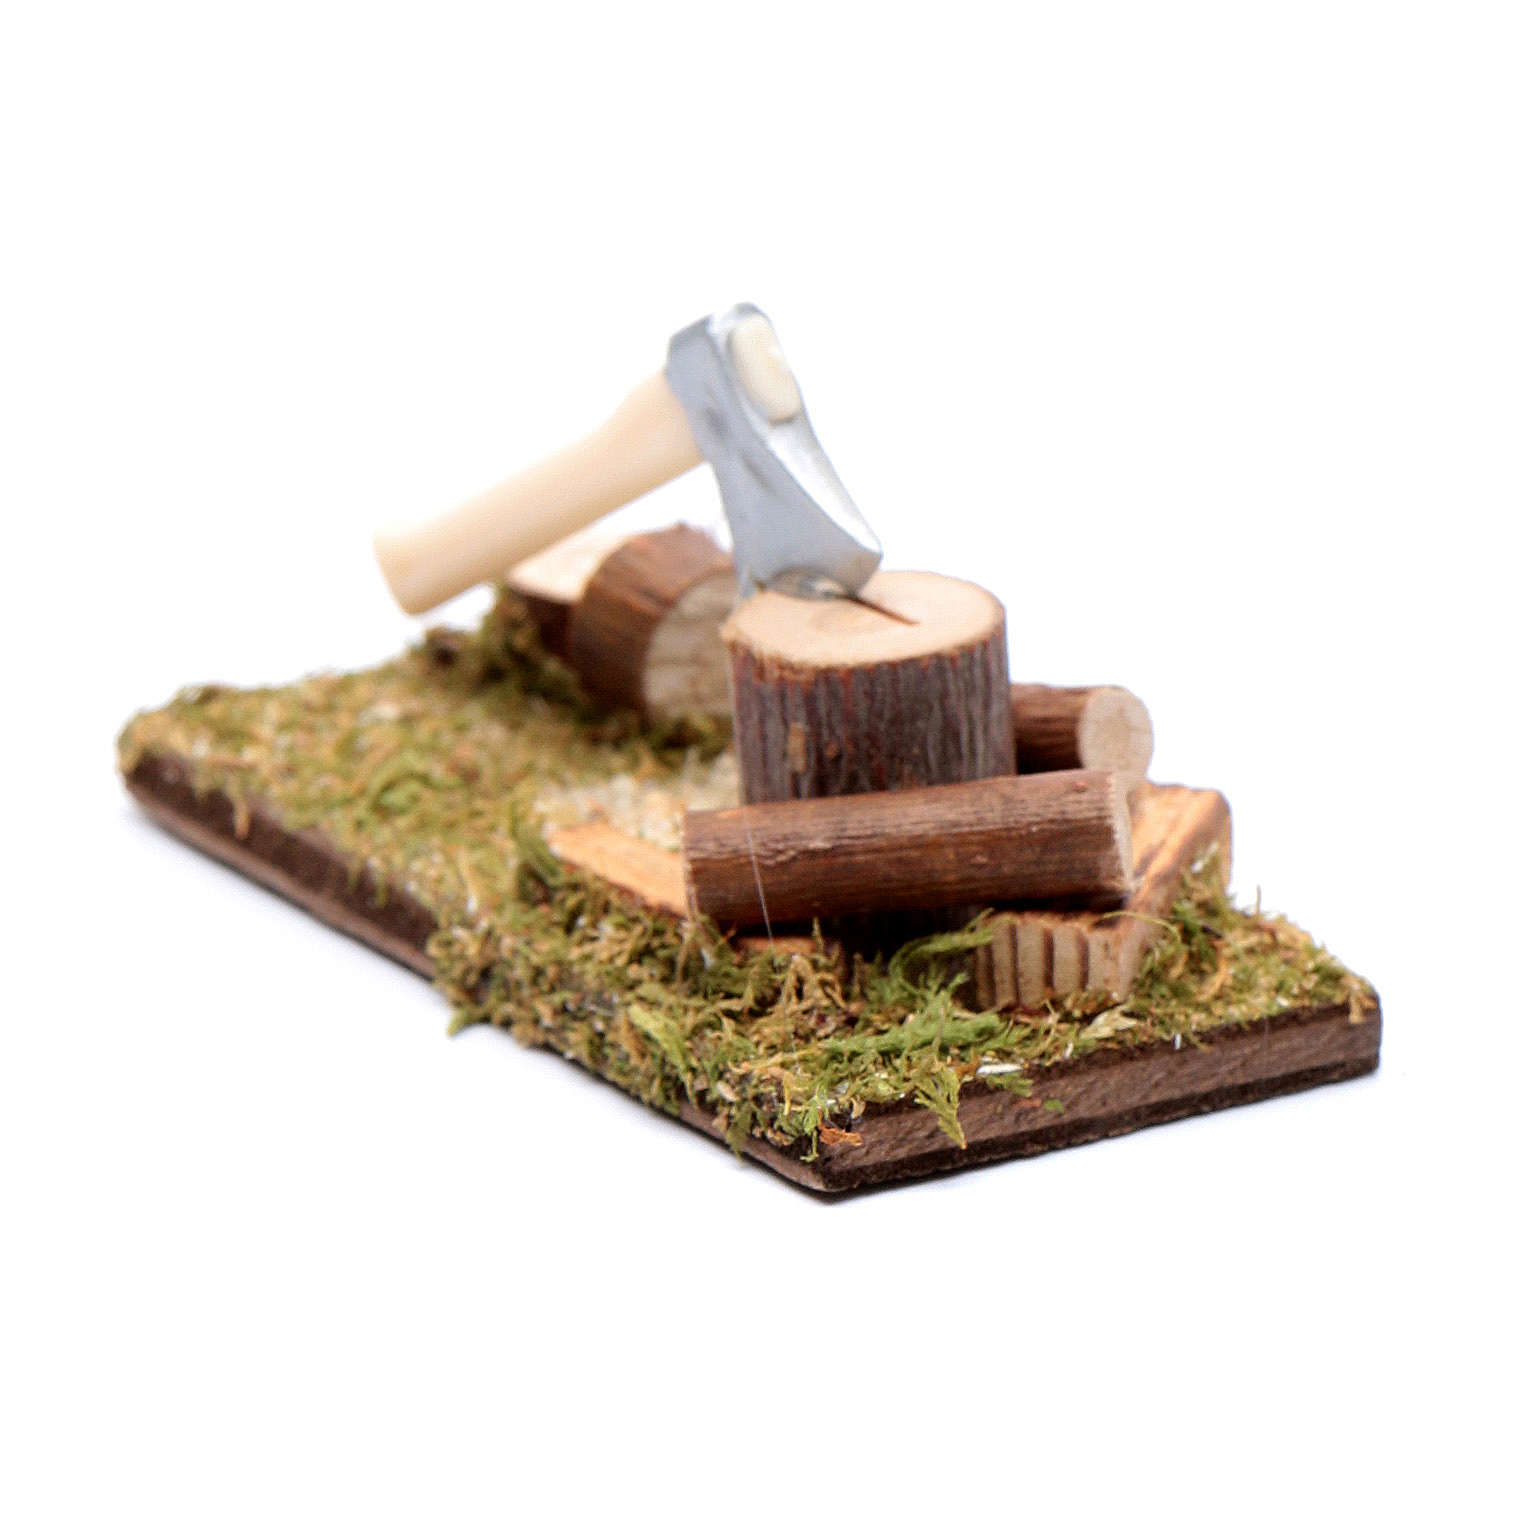 Ascia e tronchi ambientazione per presepe 4